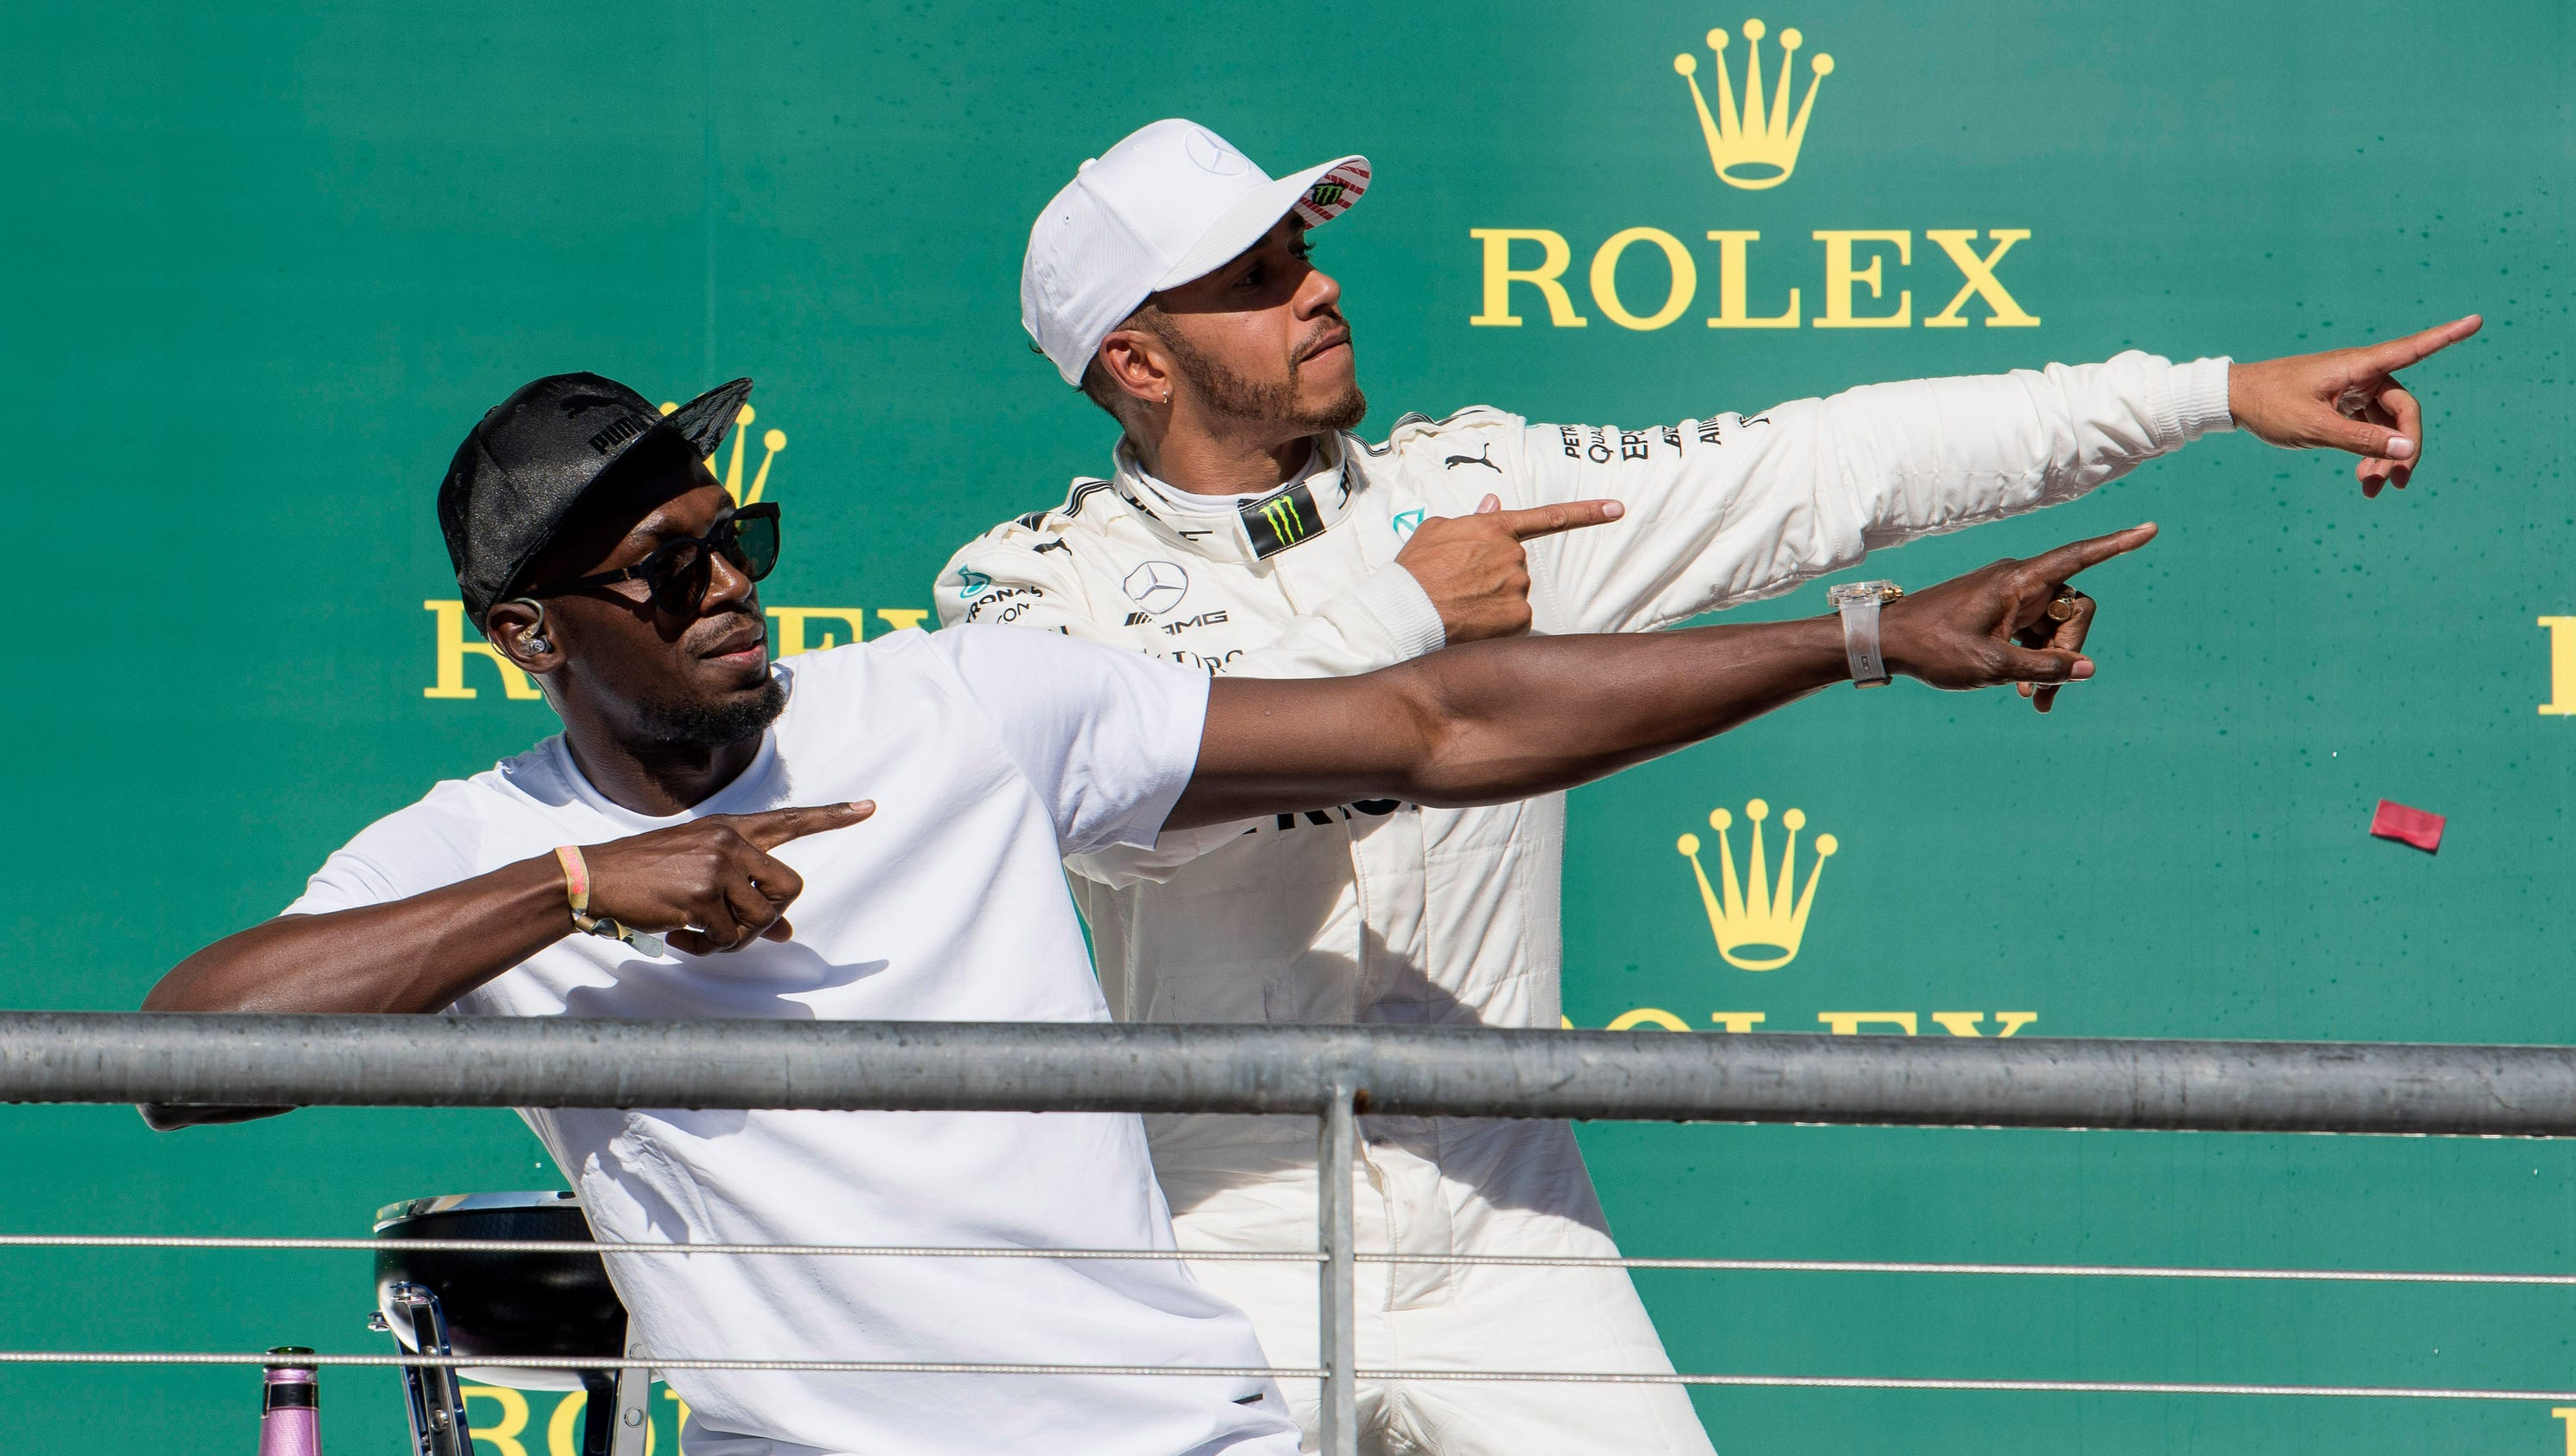 Formula 1: Lewis Hamilton wins U.S. Grand Prix to extend championship lead